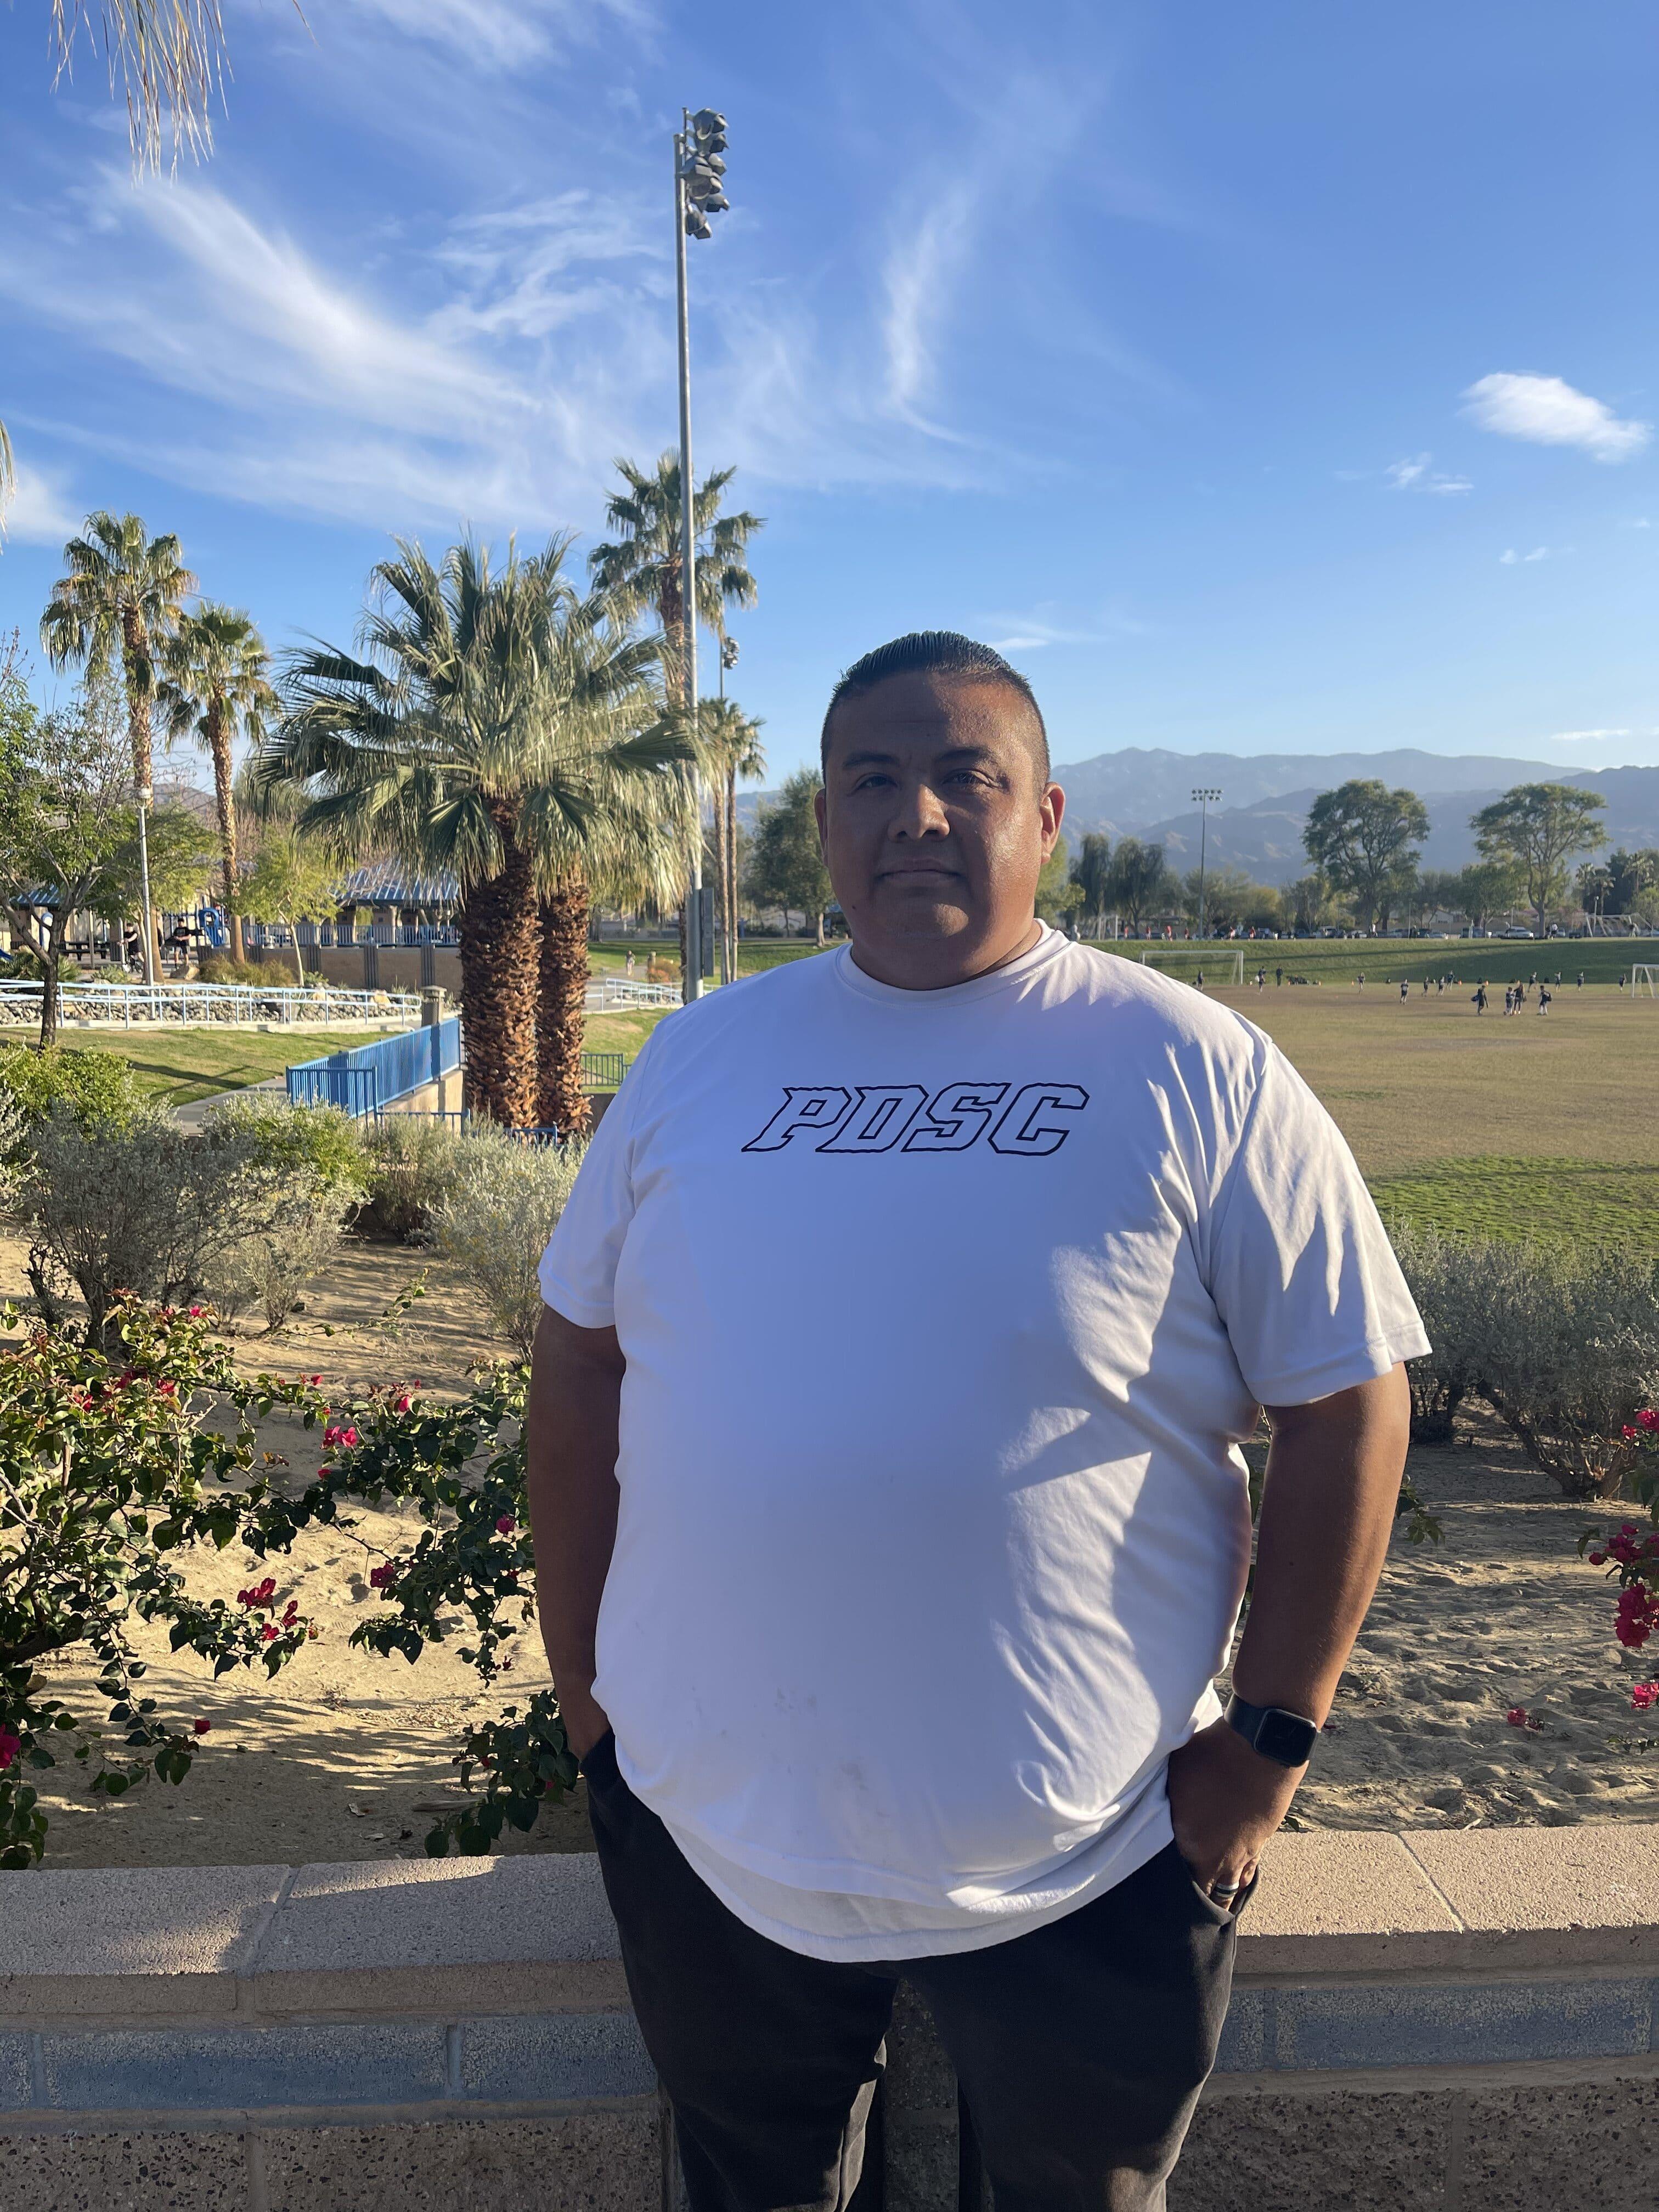 Mark B08 and G12 Palm Desert Soccer Club